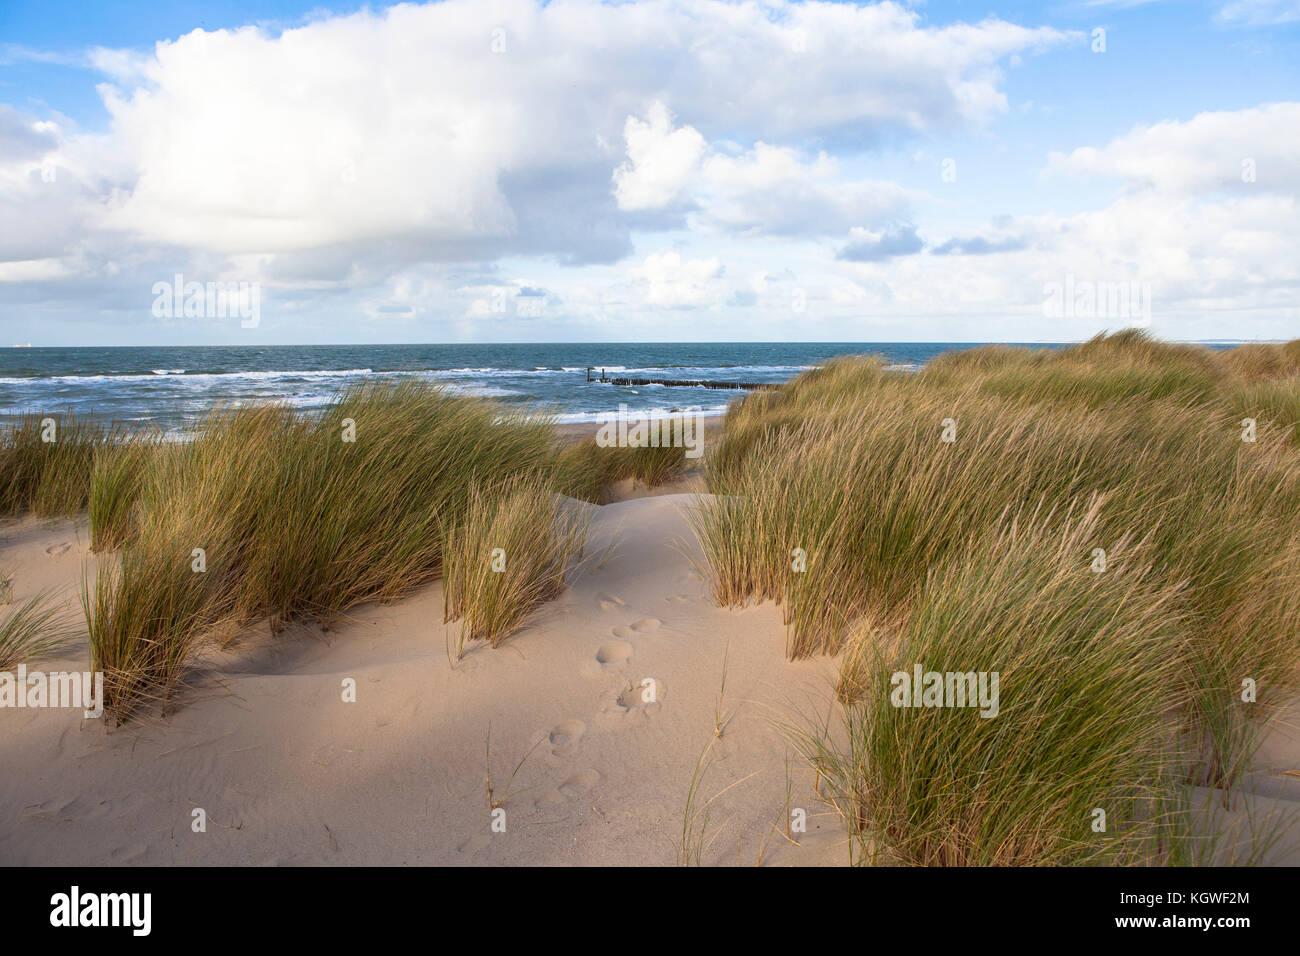 Netherlands, Zeeland, sand-sedge at the beach in Oostkapelle on the peninsula Walcheren.  Niederlande, Zeeland, - Stock Image